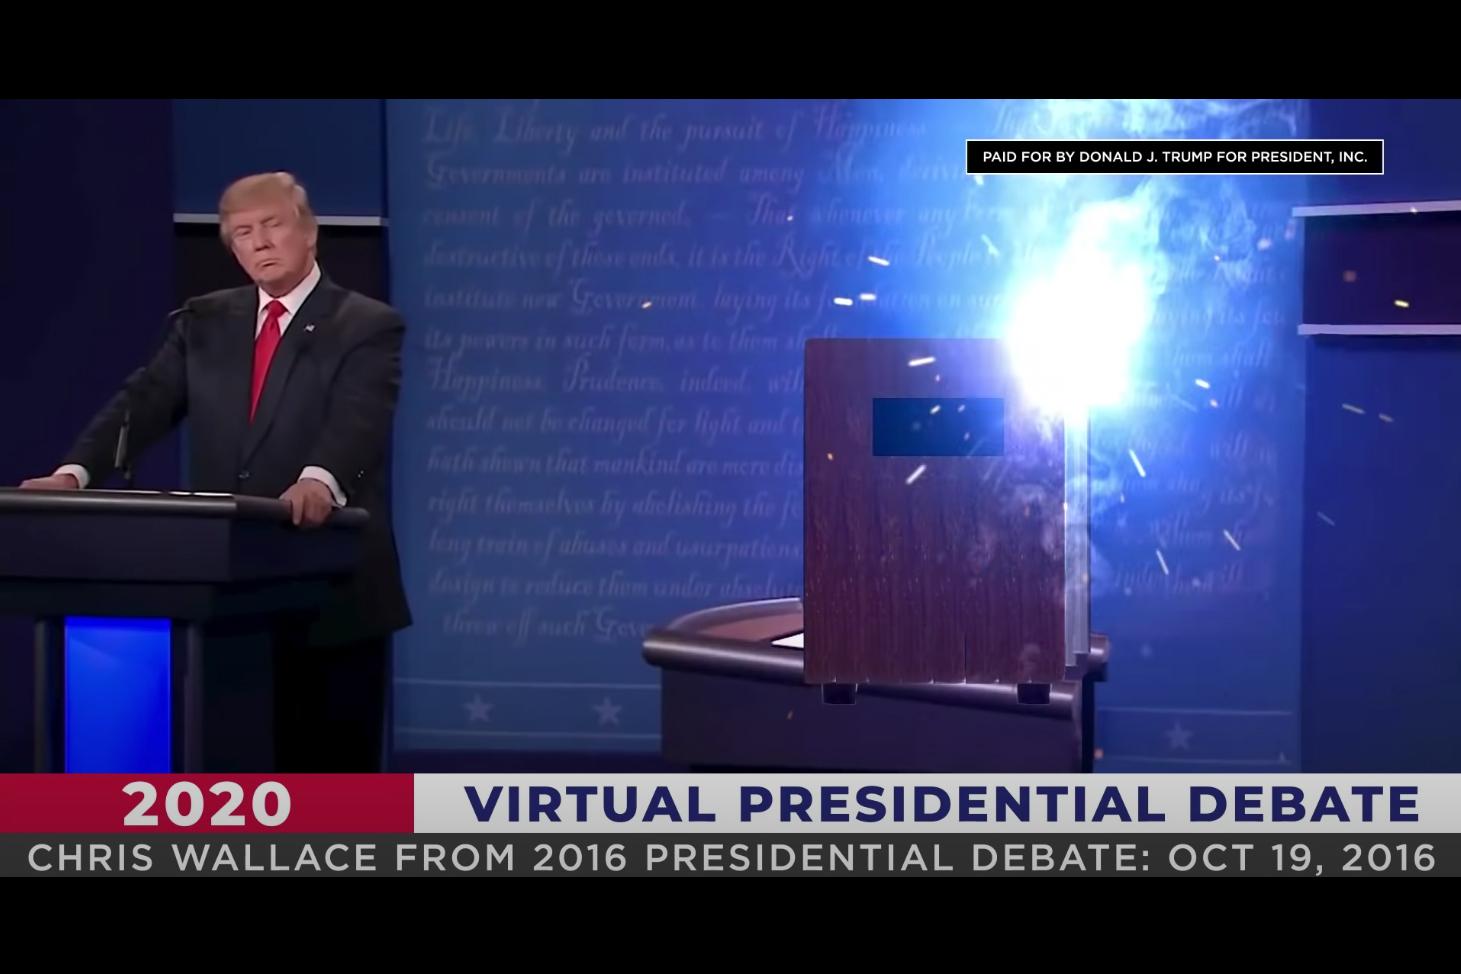 'Joe Biden Malfunctions': Trump attack ad mocks the idea of a virtual debate